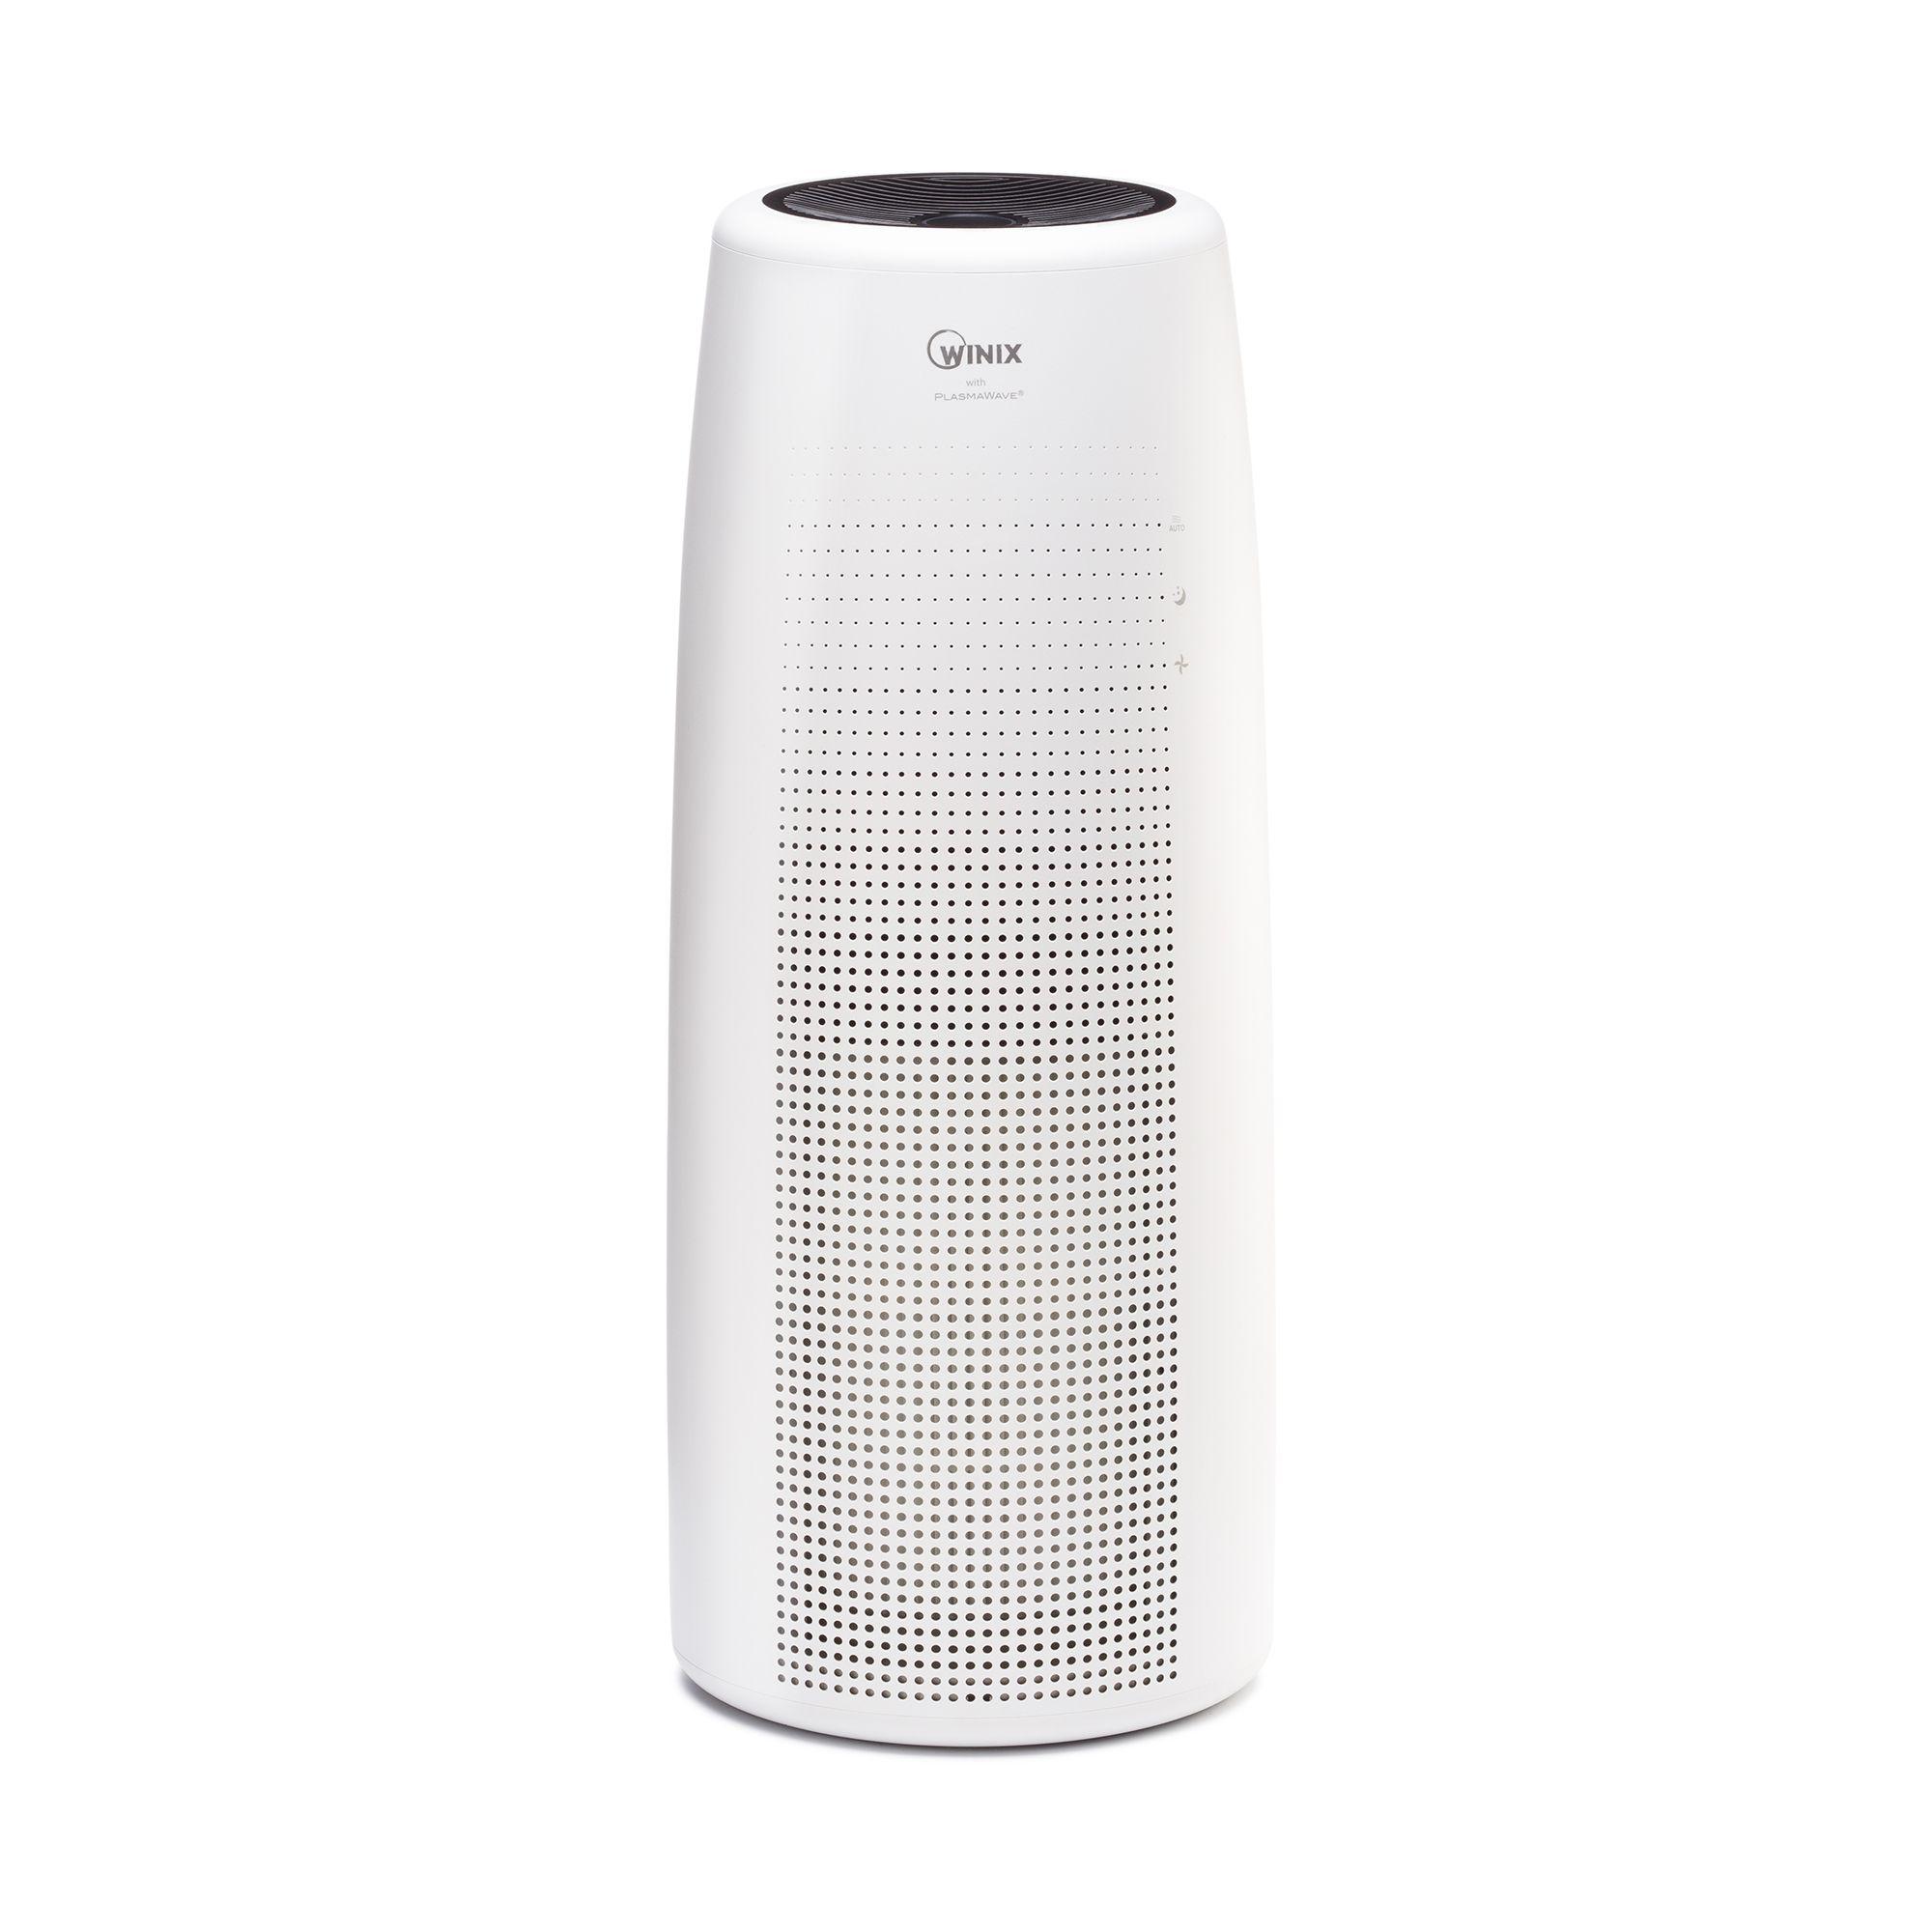 Nk100 Air purifier, Energy star